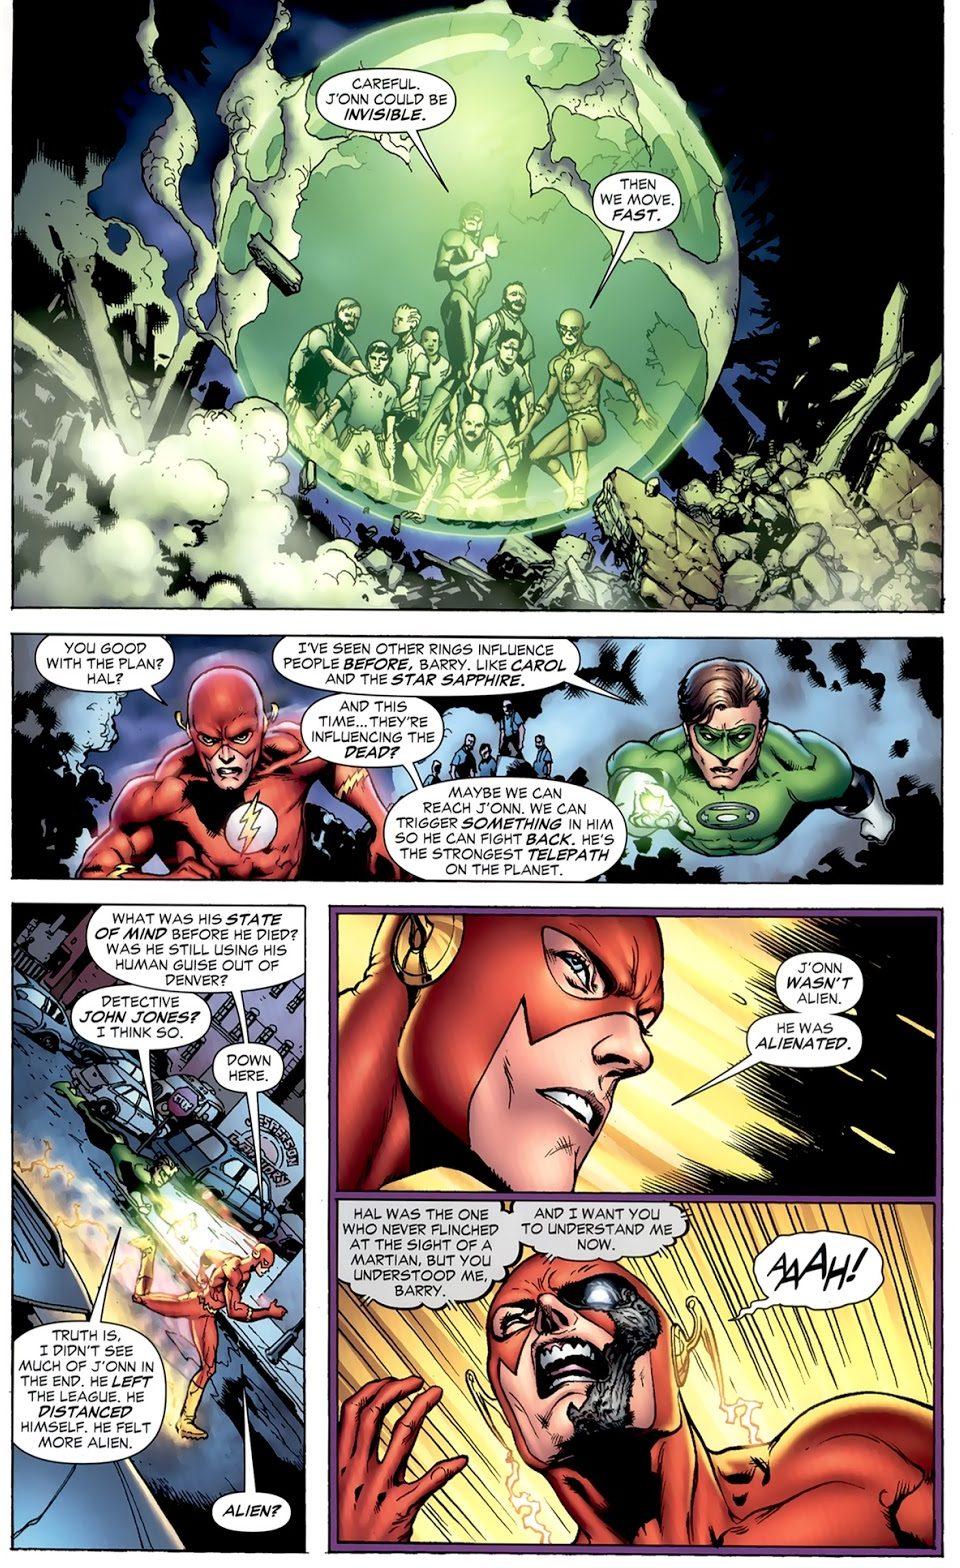 Green Lantern And The Flash VS Black Lantern Martian Manhunter